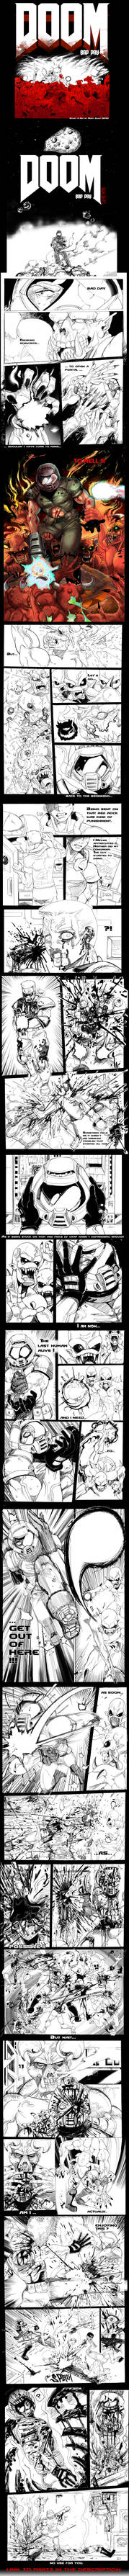 DOOM BAD DAY Pt 1/2 (Comic) by MaKuZoKu